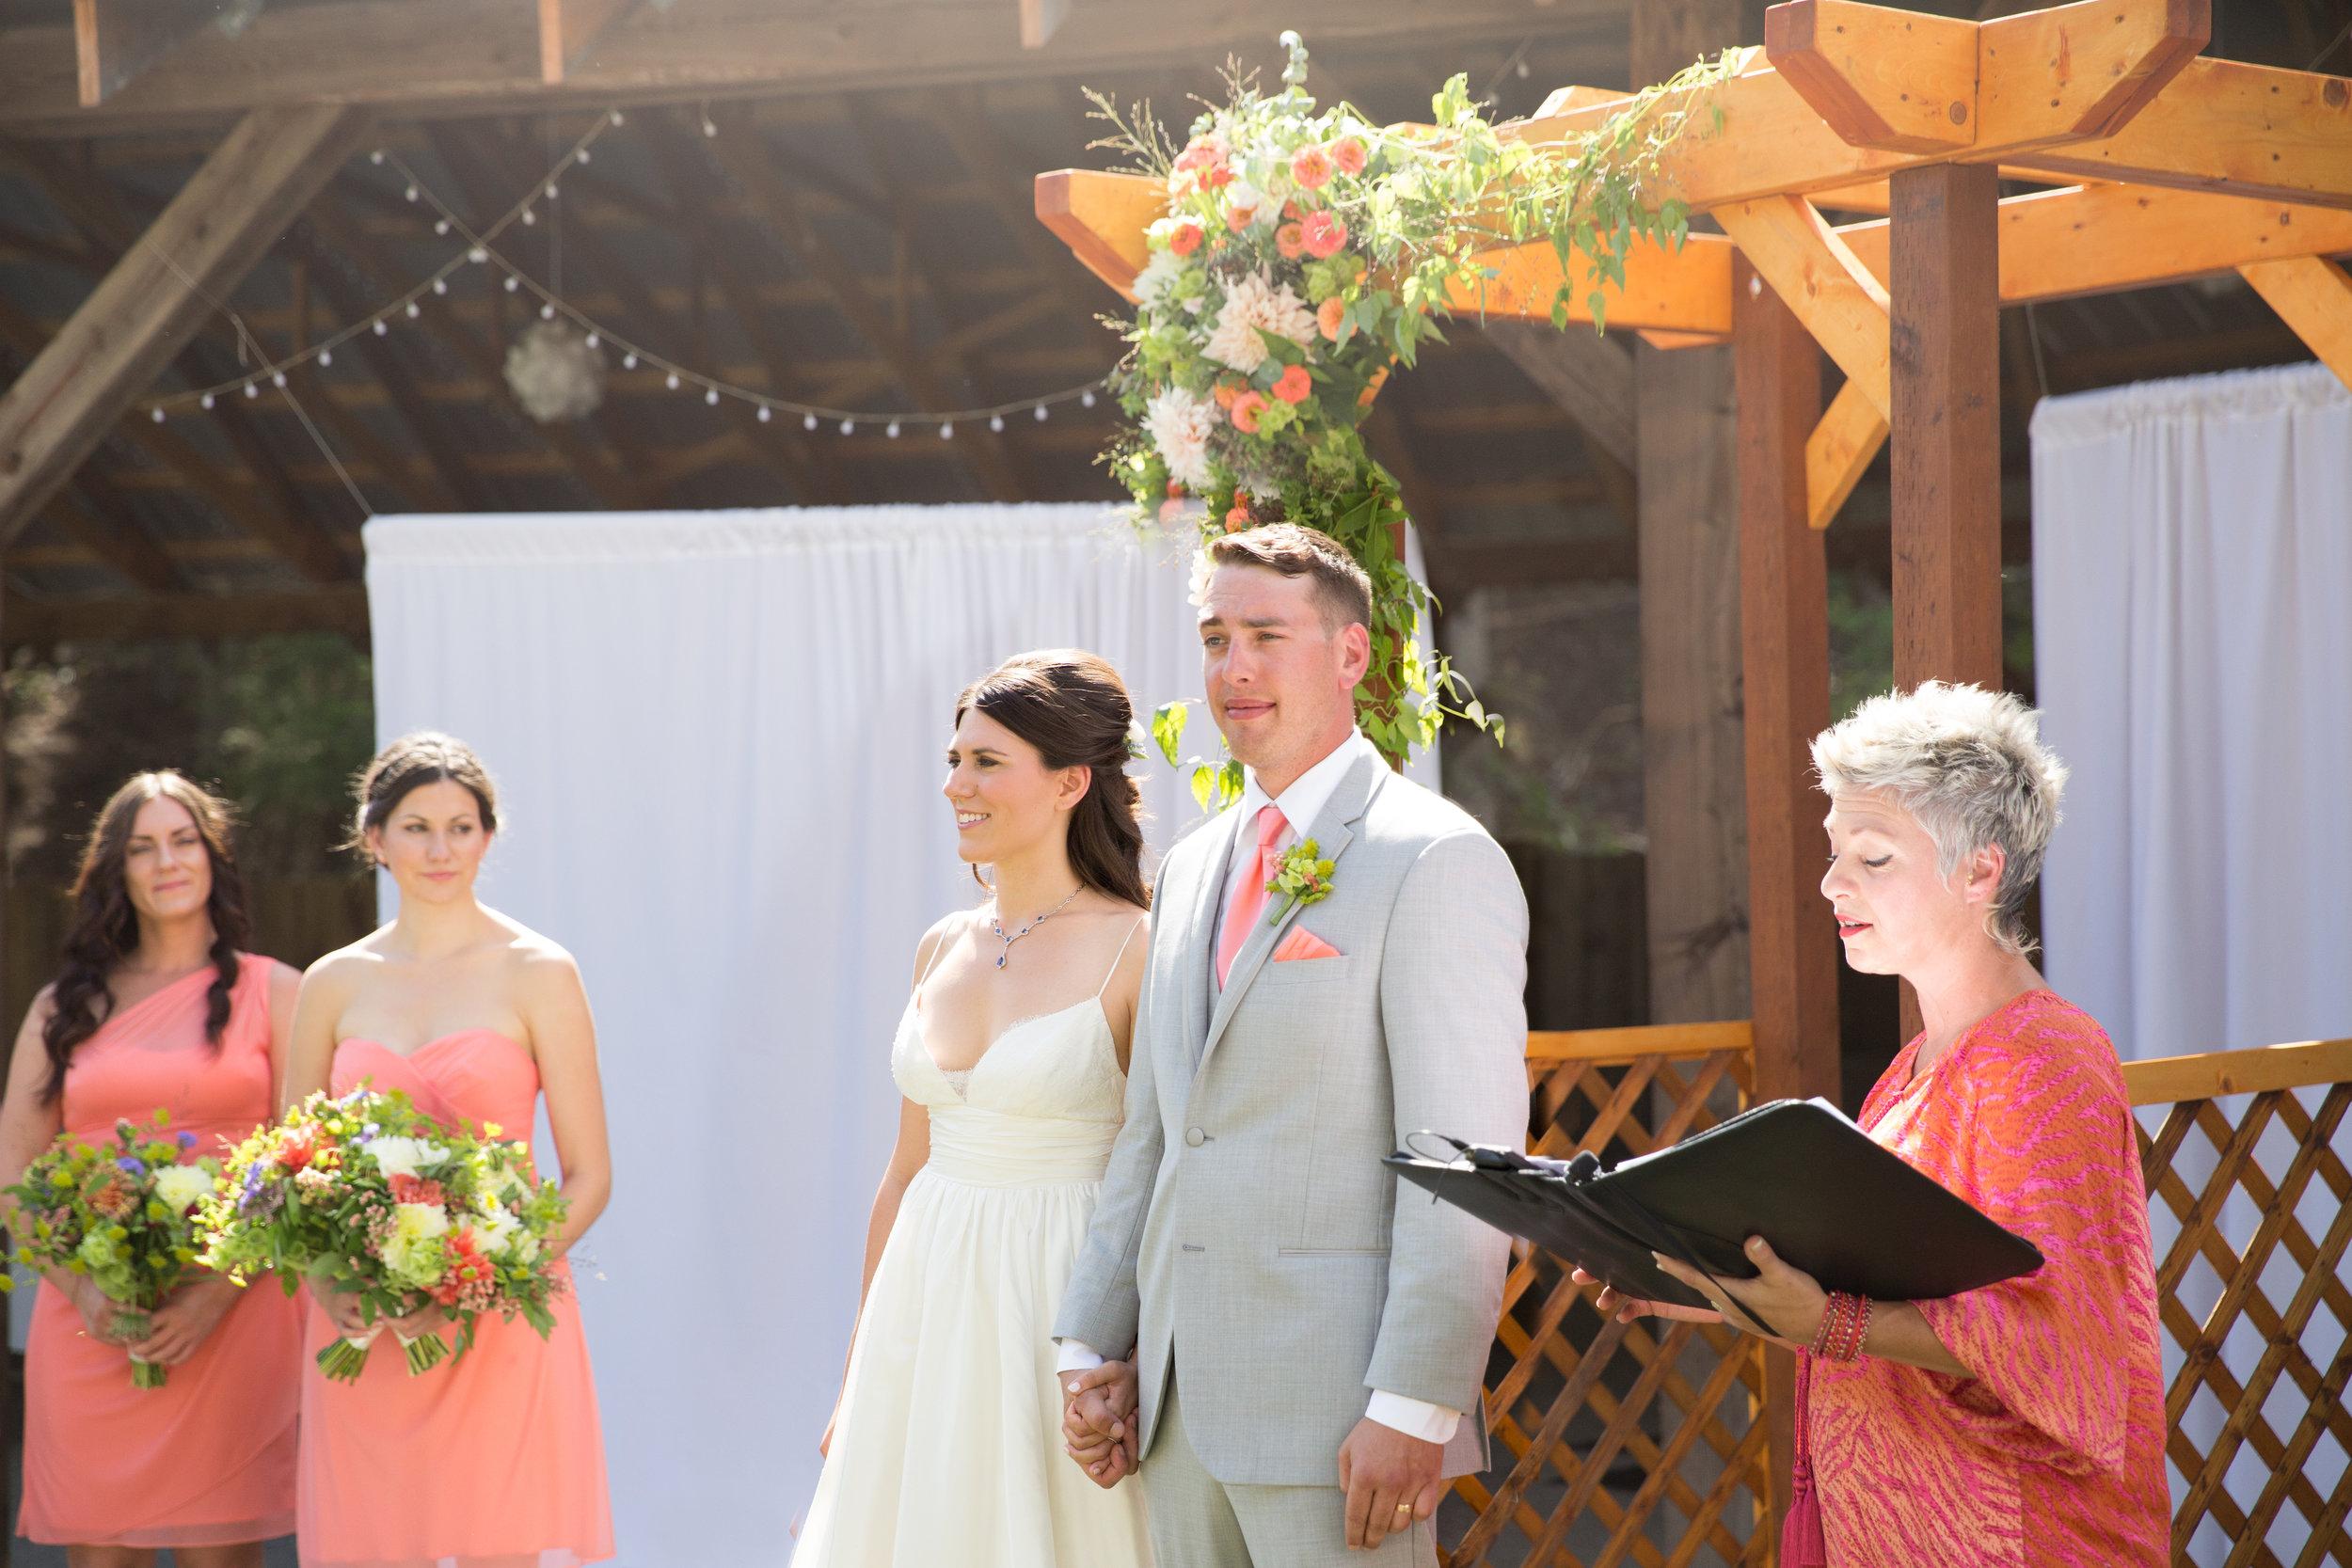 Seth & Jessica wedding at  Shylynn Ranch  at Falkland British Columbia Canada.